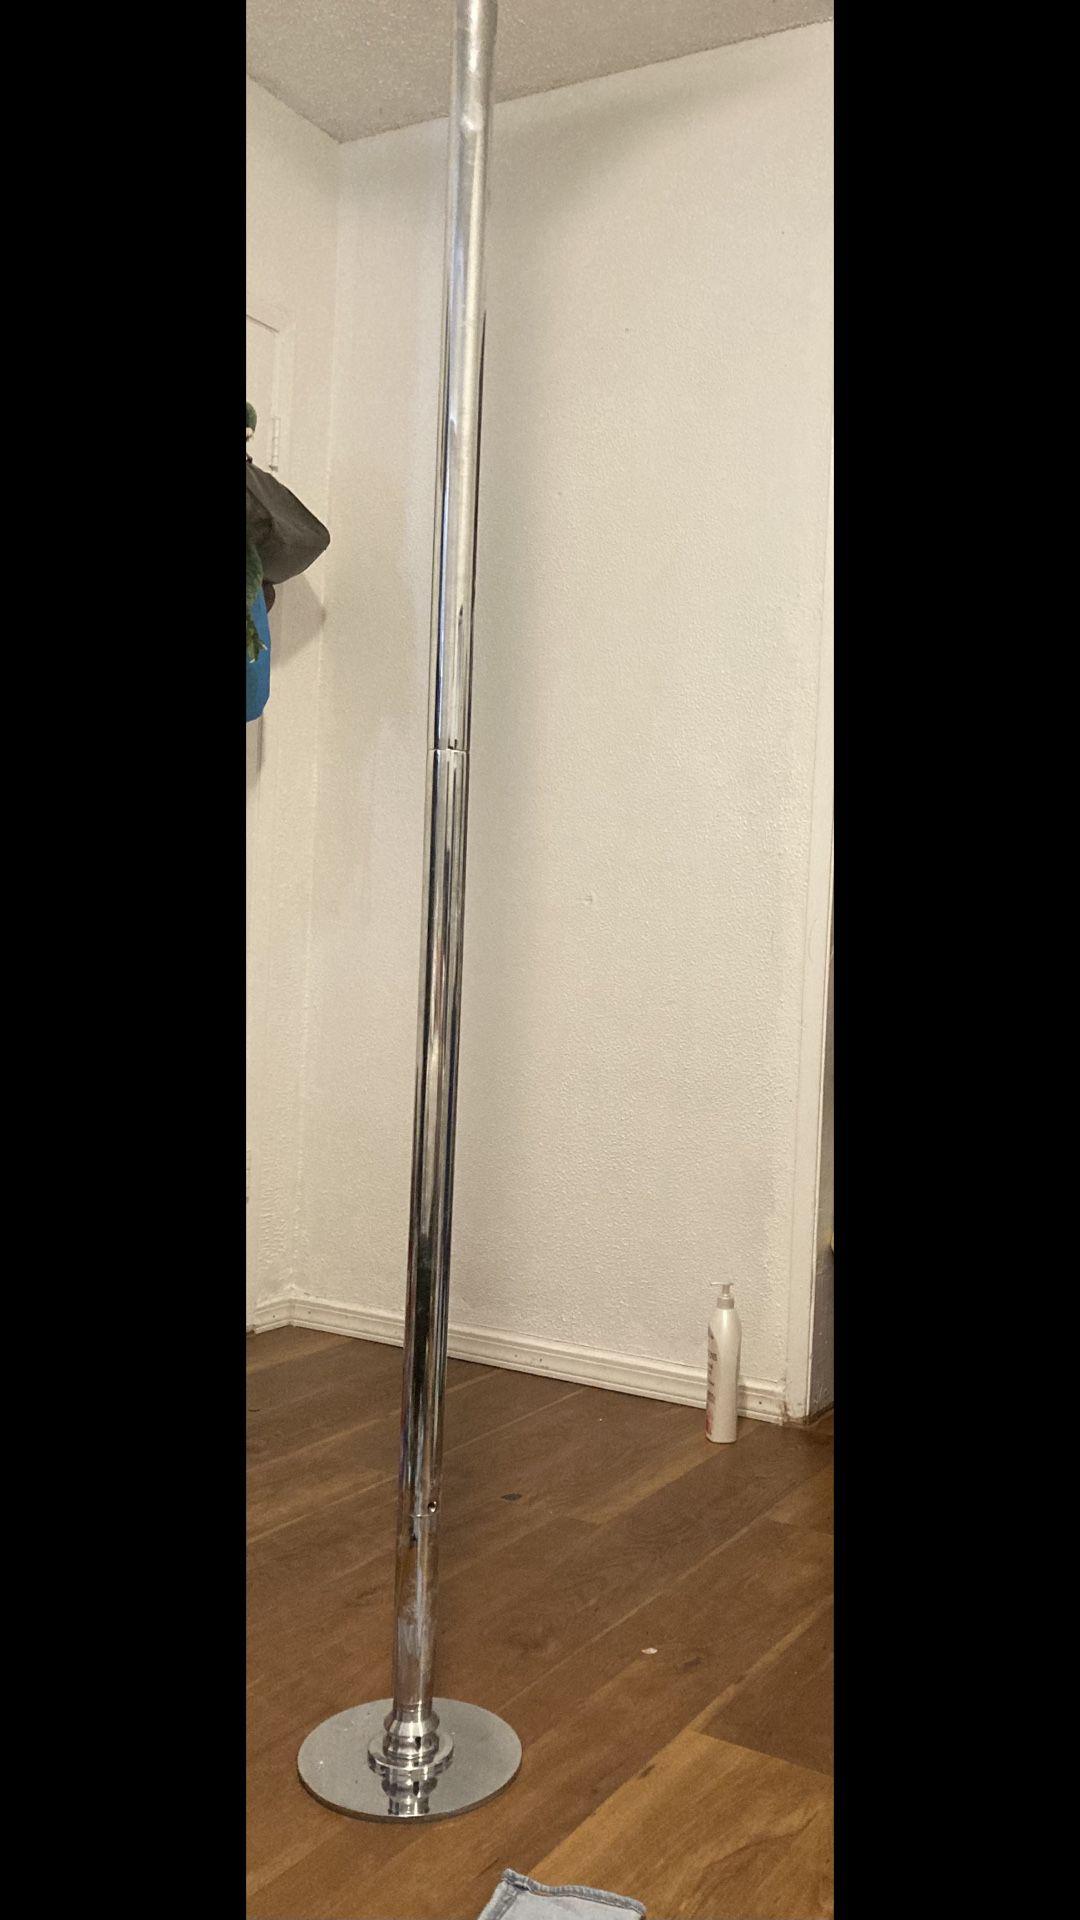 Stripper Dancing Pole